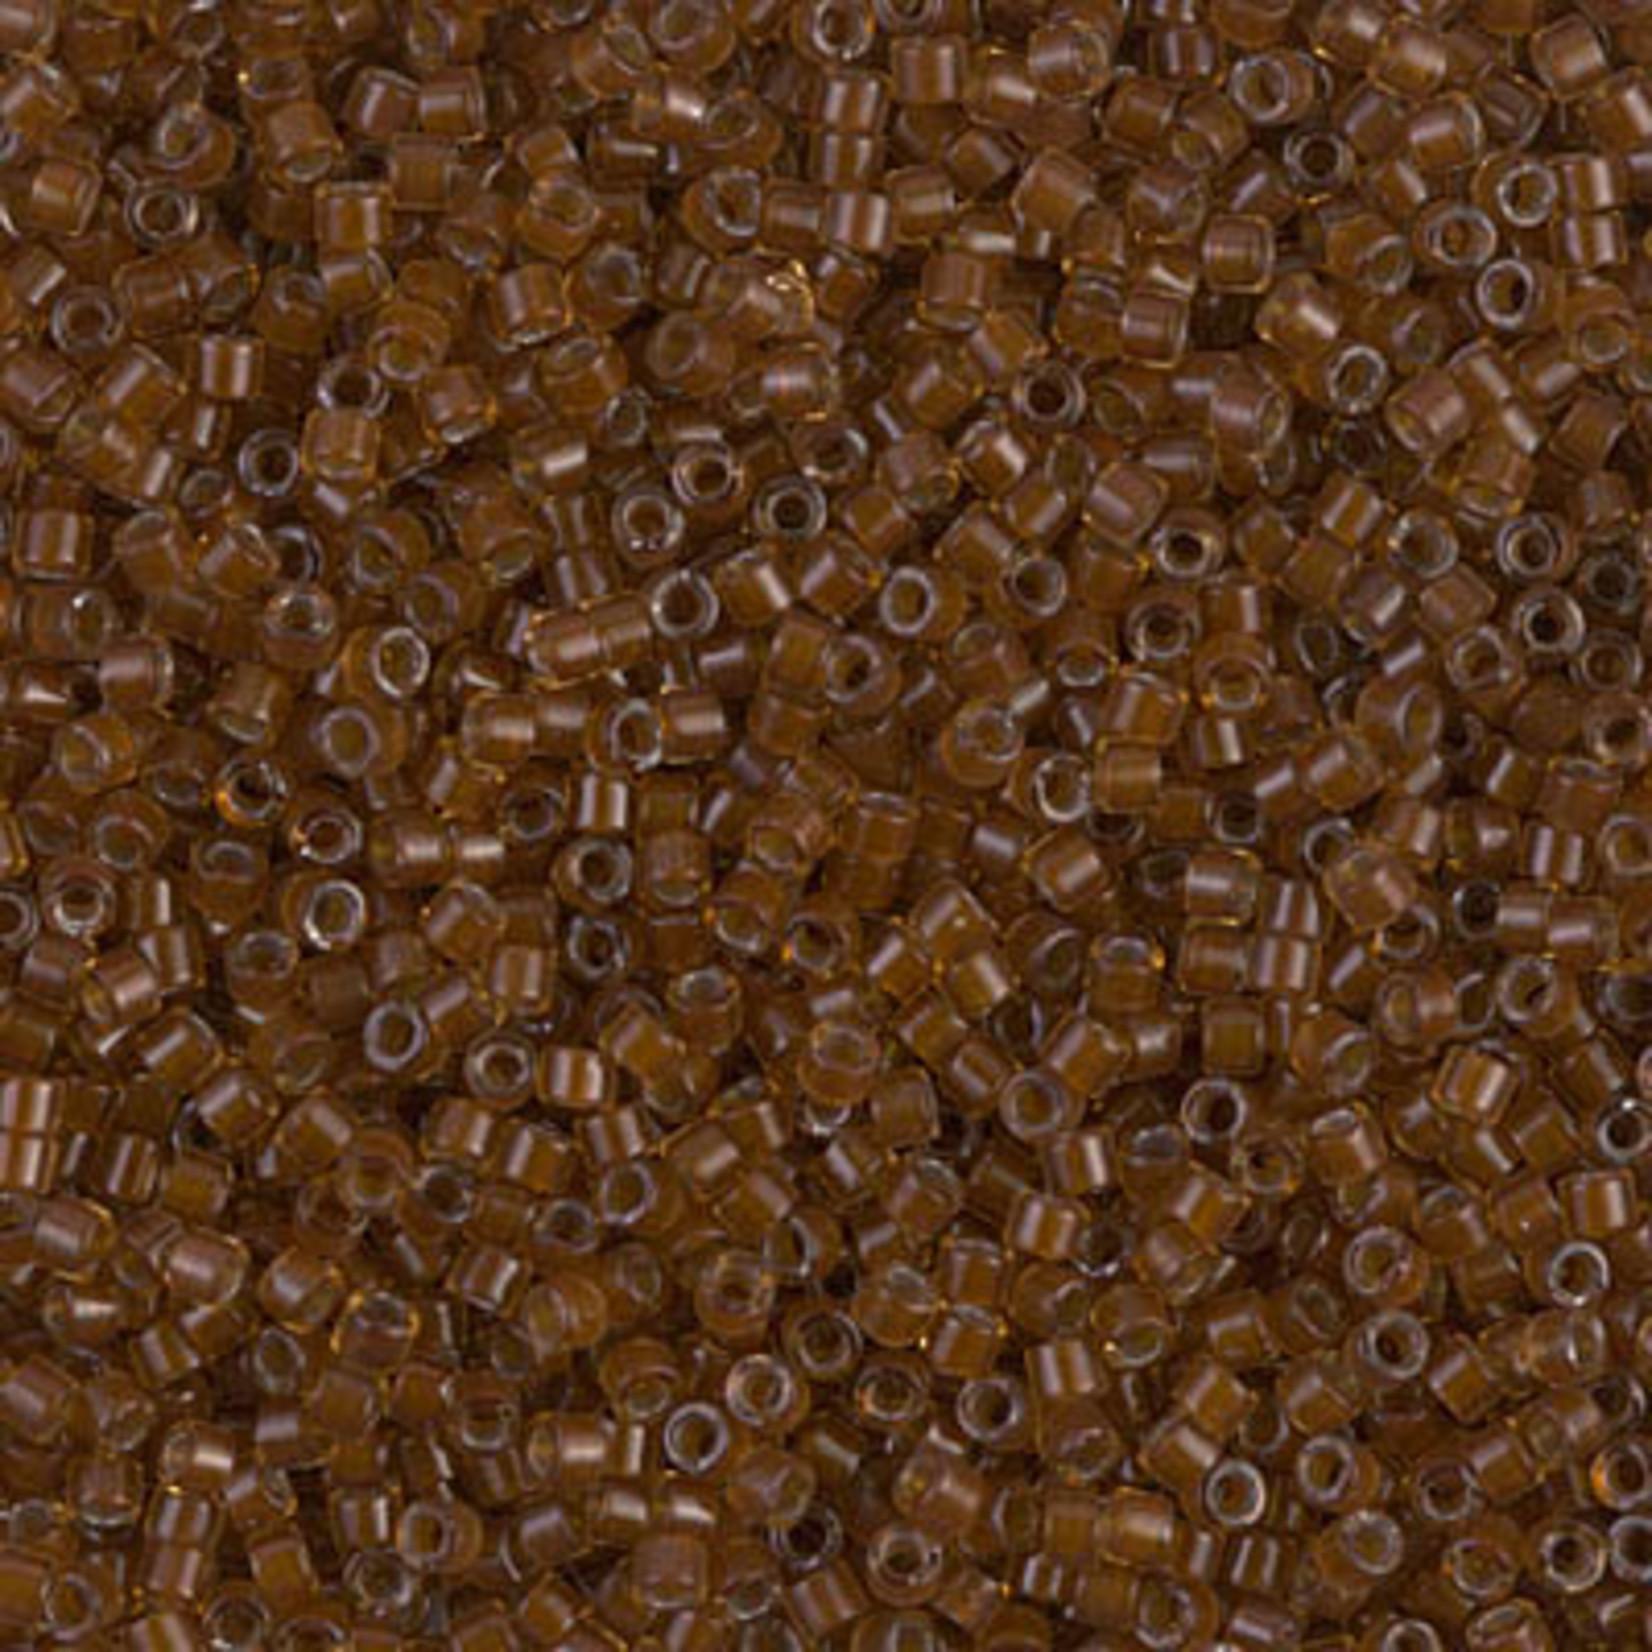 Miyuki 7.2 GM DB1393 11/0 Delica: Golden Brown/Chocolate ICL* (APX 1400 PCS)